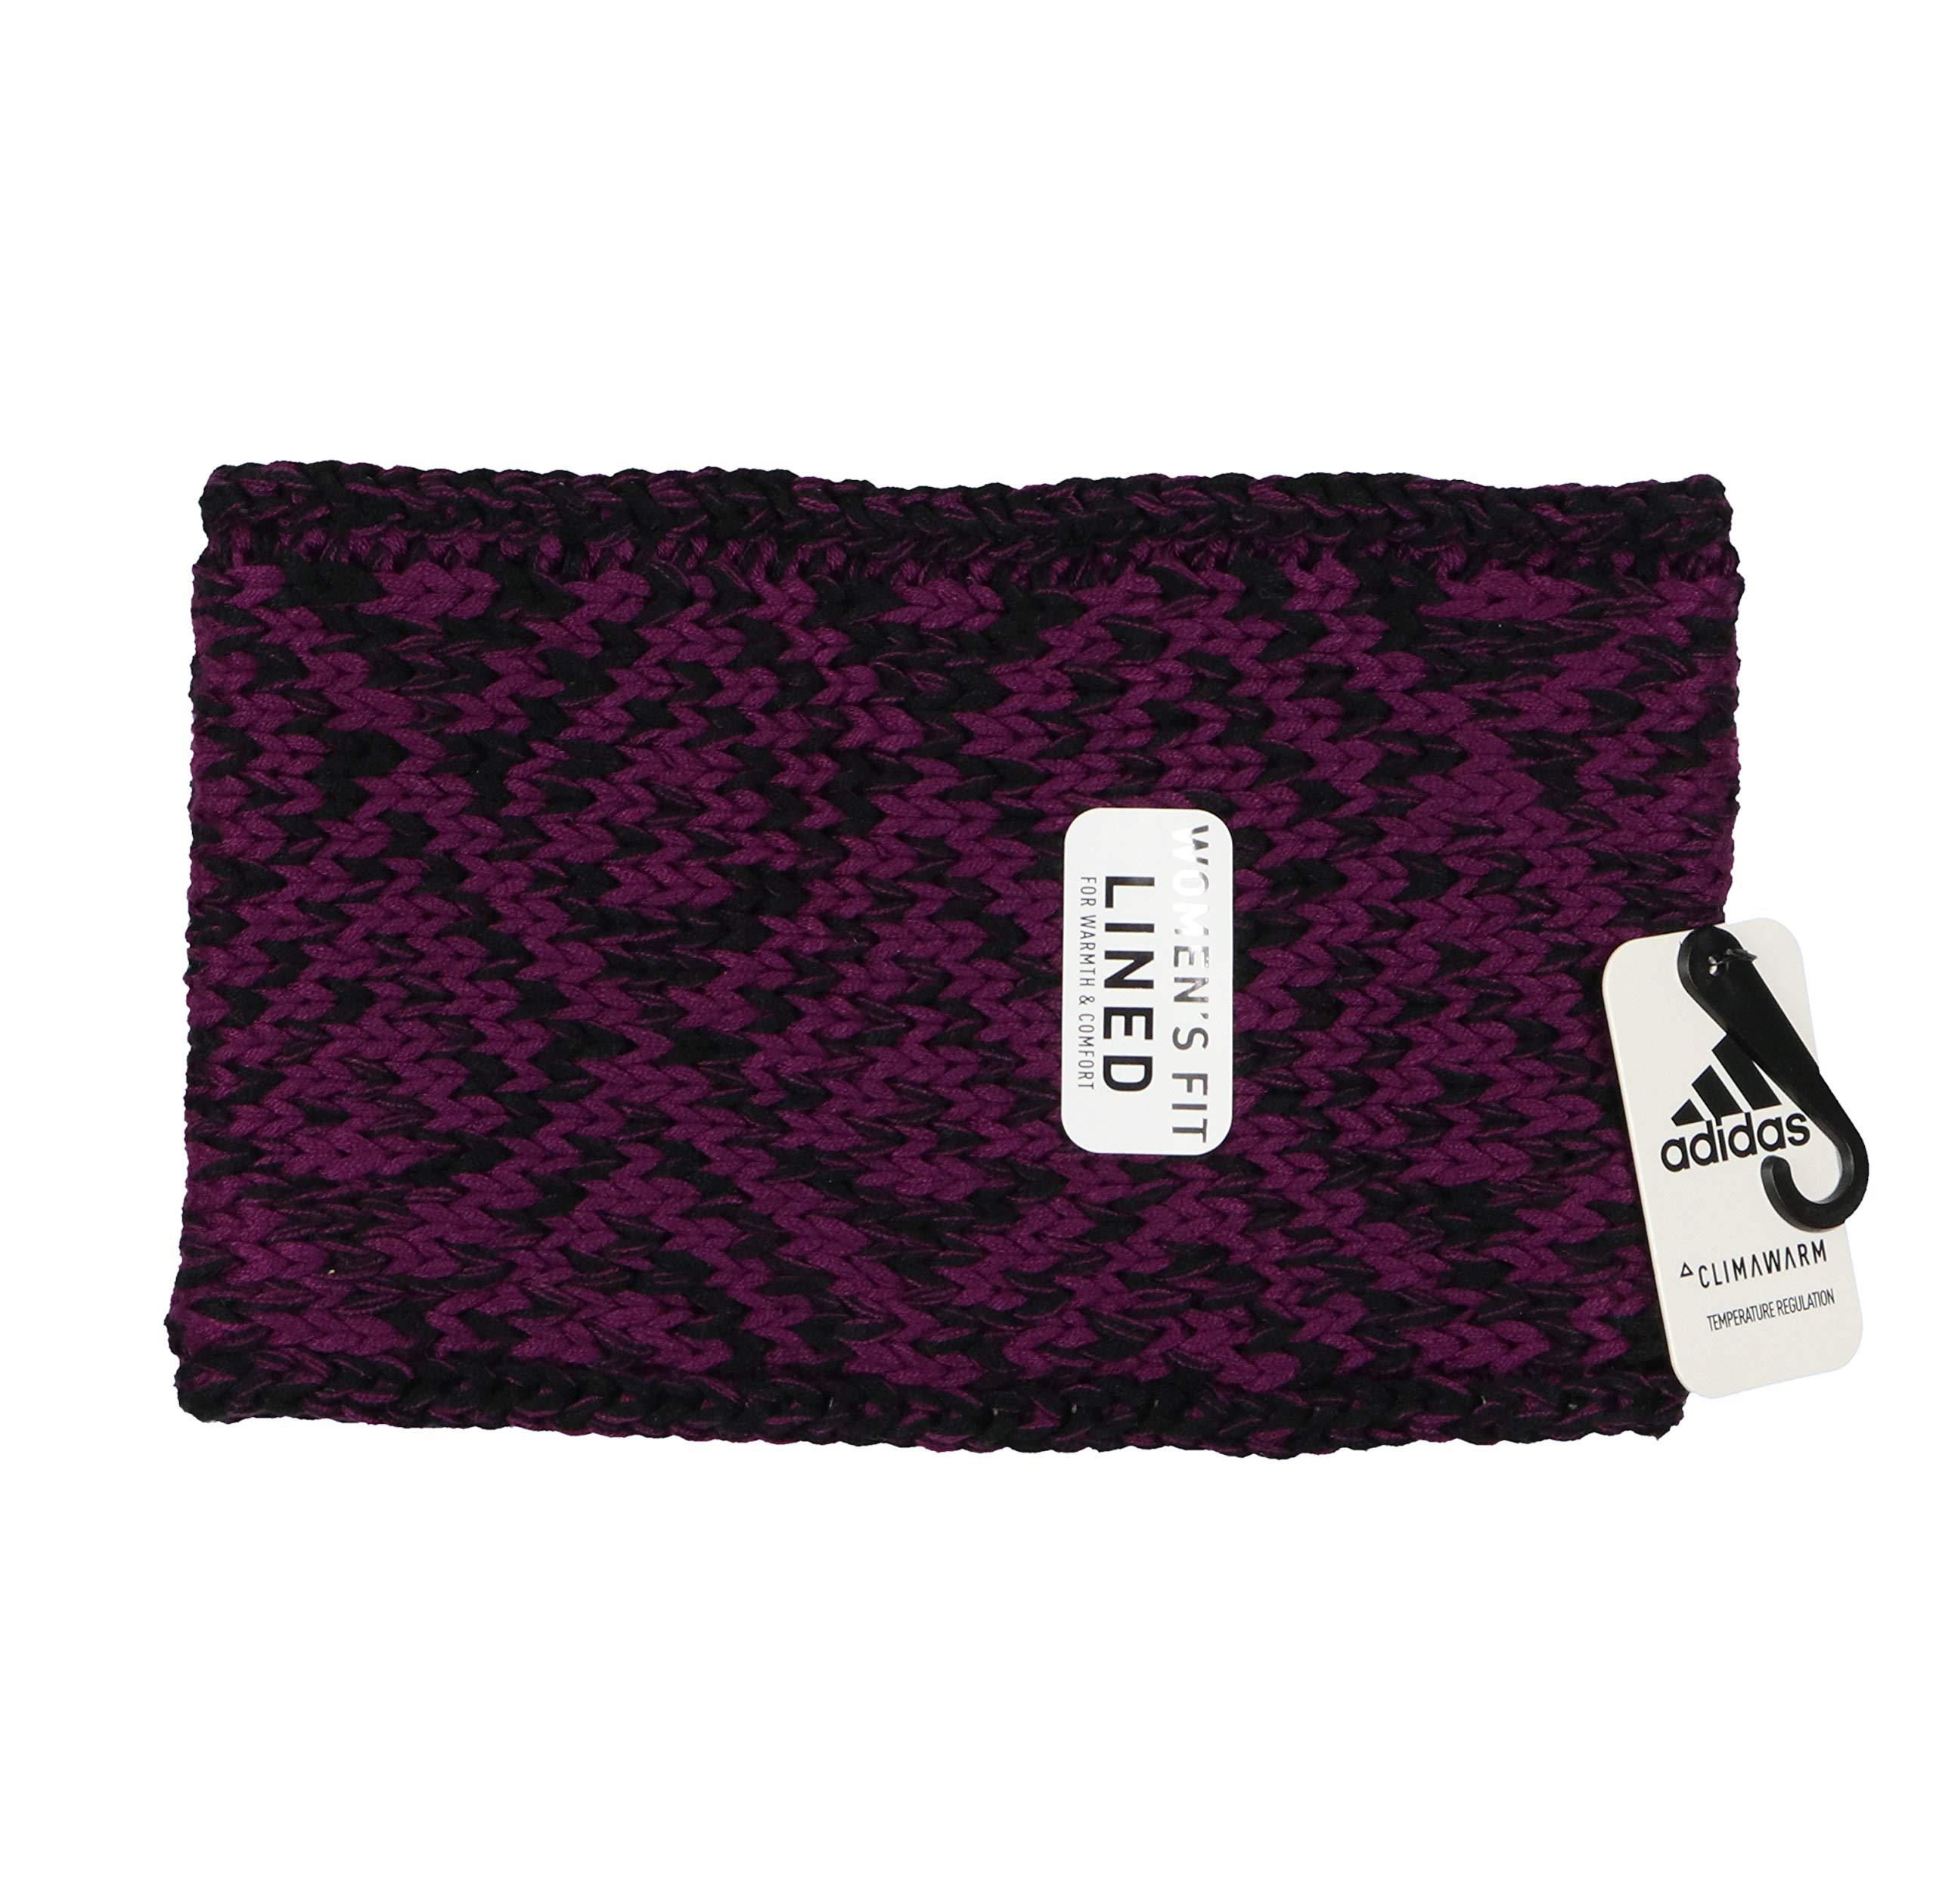 201c926c 2018 Adidas Ultra Boost 1.0 OG 7-14 Core Black Purple G28319 UltraBoost.  $199.99. Adidas Women's Holiday II Knit Headband One Size Purple Black  Button ...